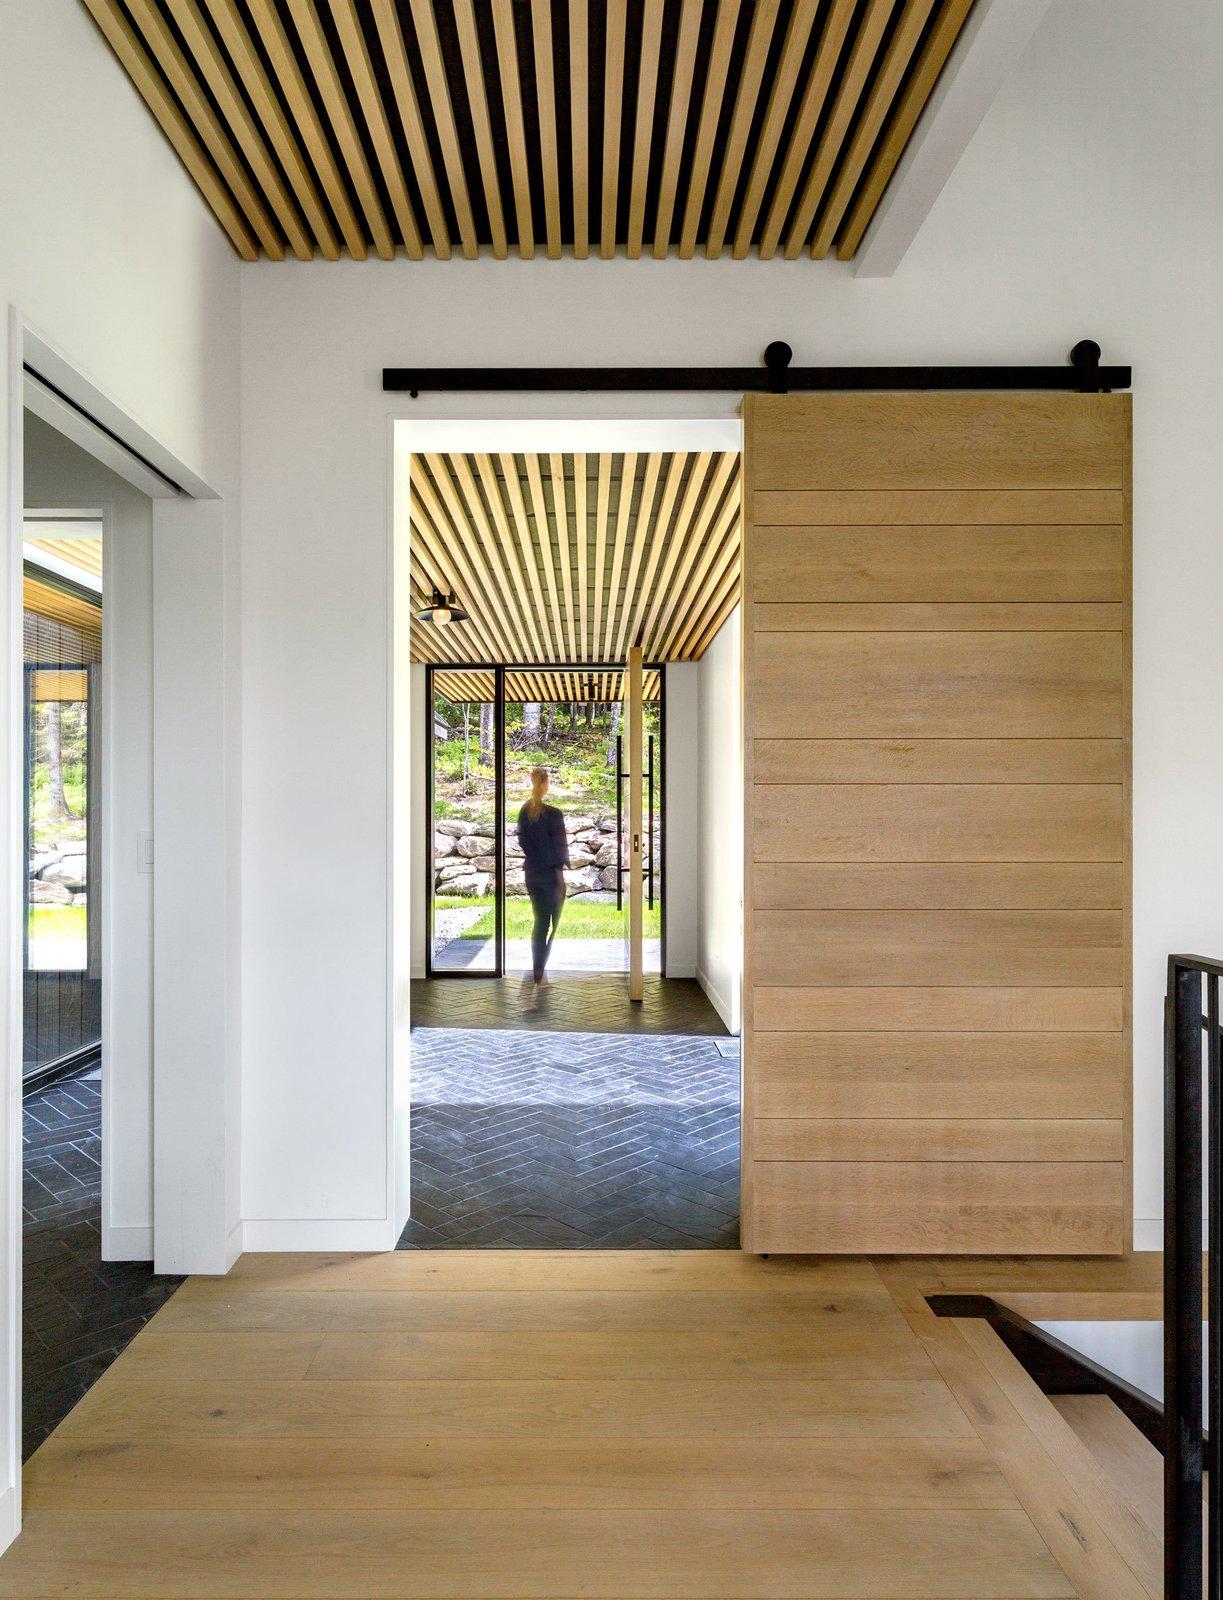 Doors, Wood, Sliding Door Type, and Interior  Elemental House by Elizabeth Herrmann Architecture + Design